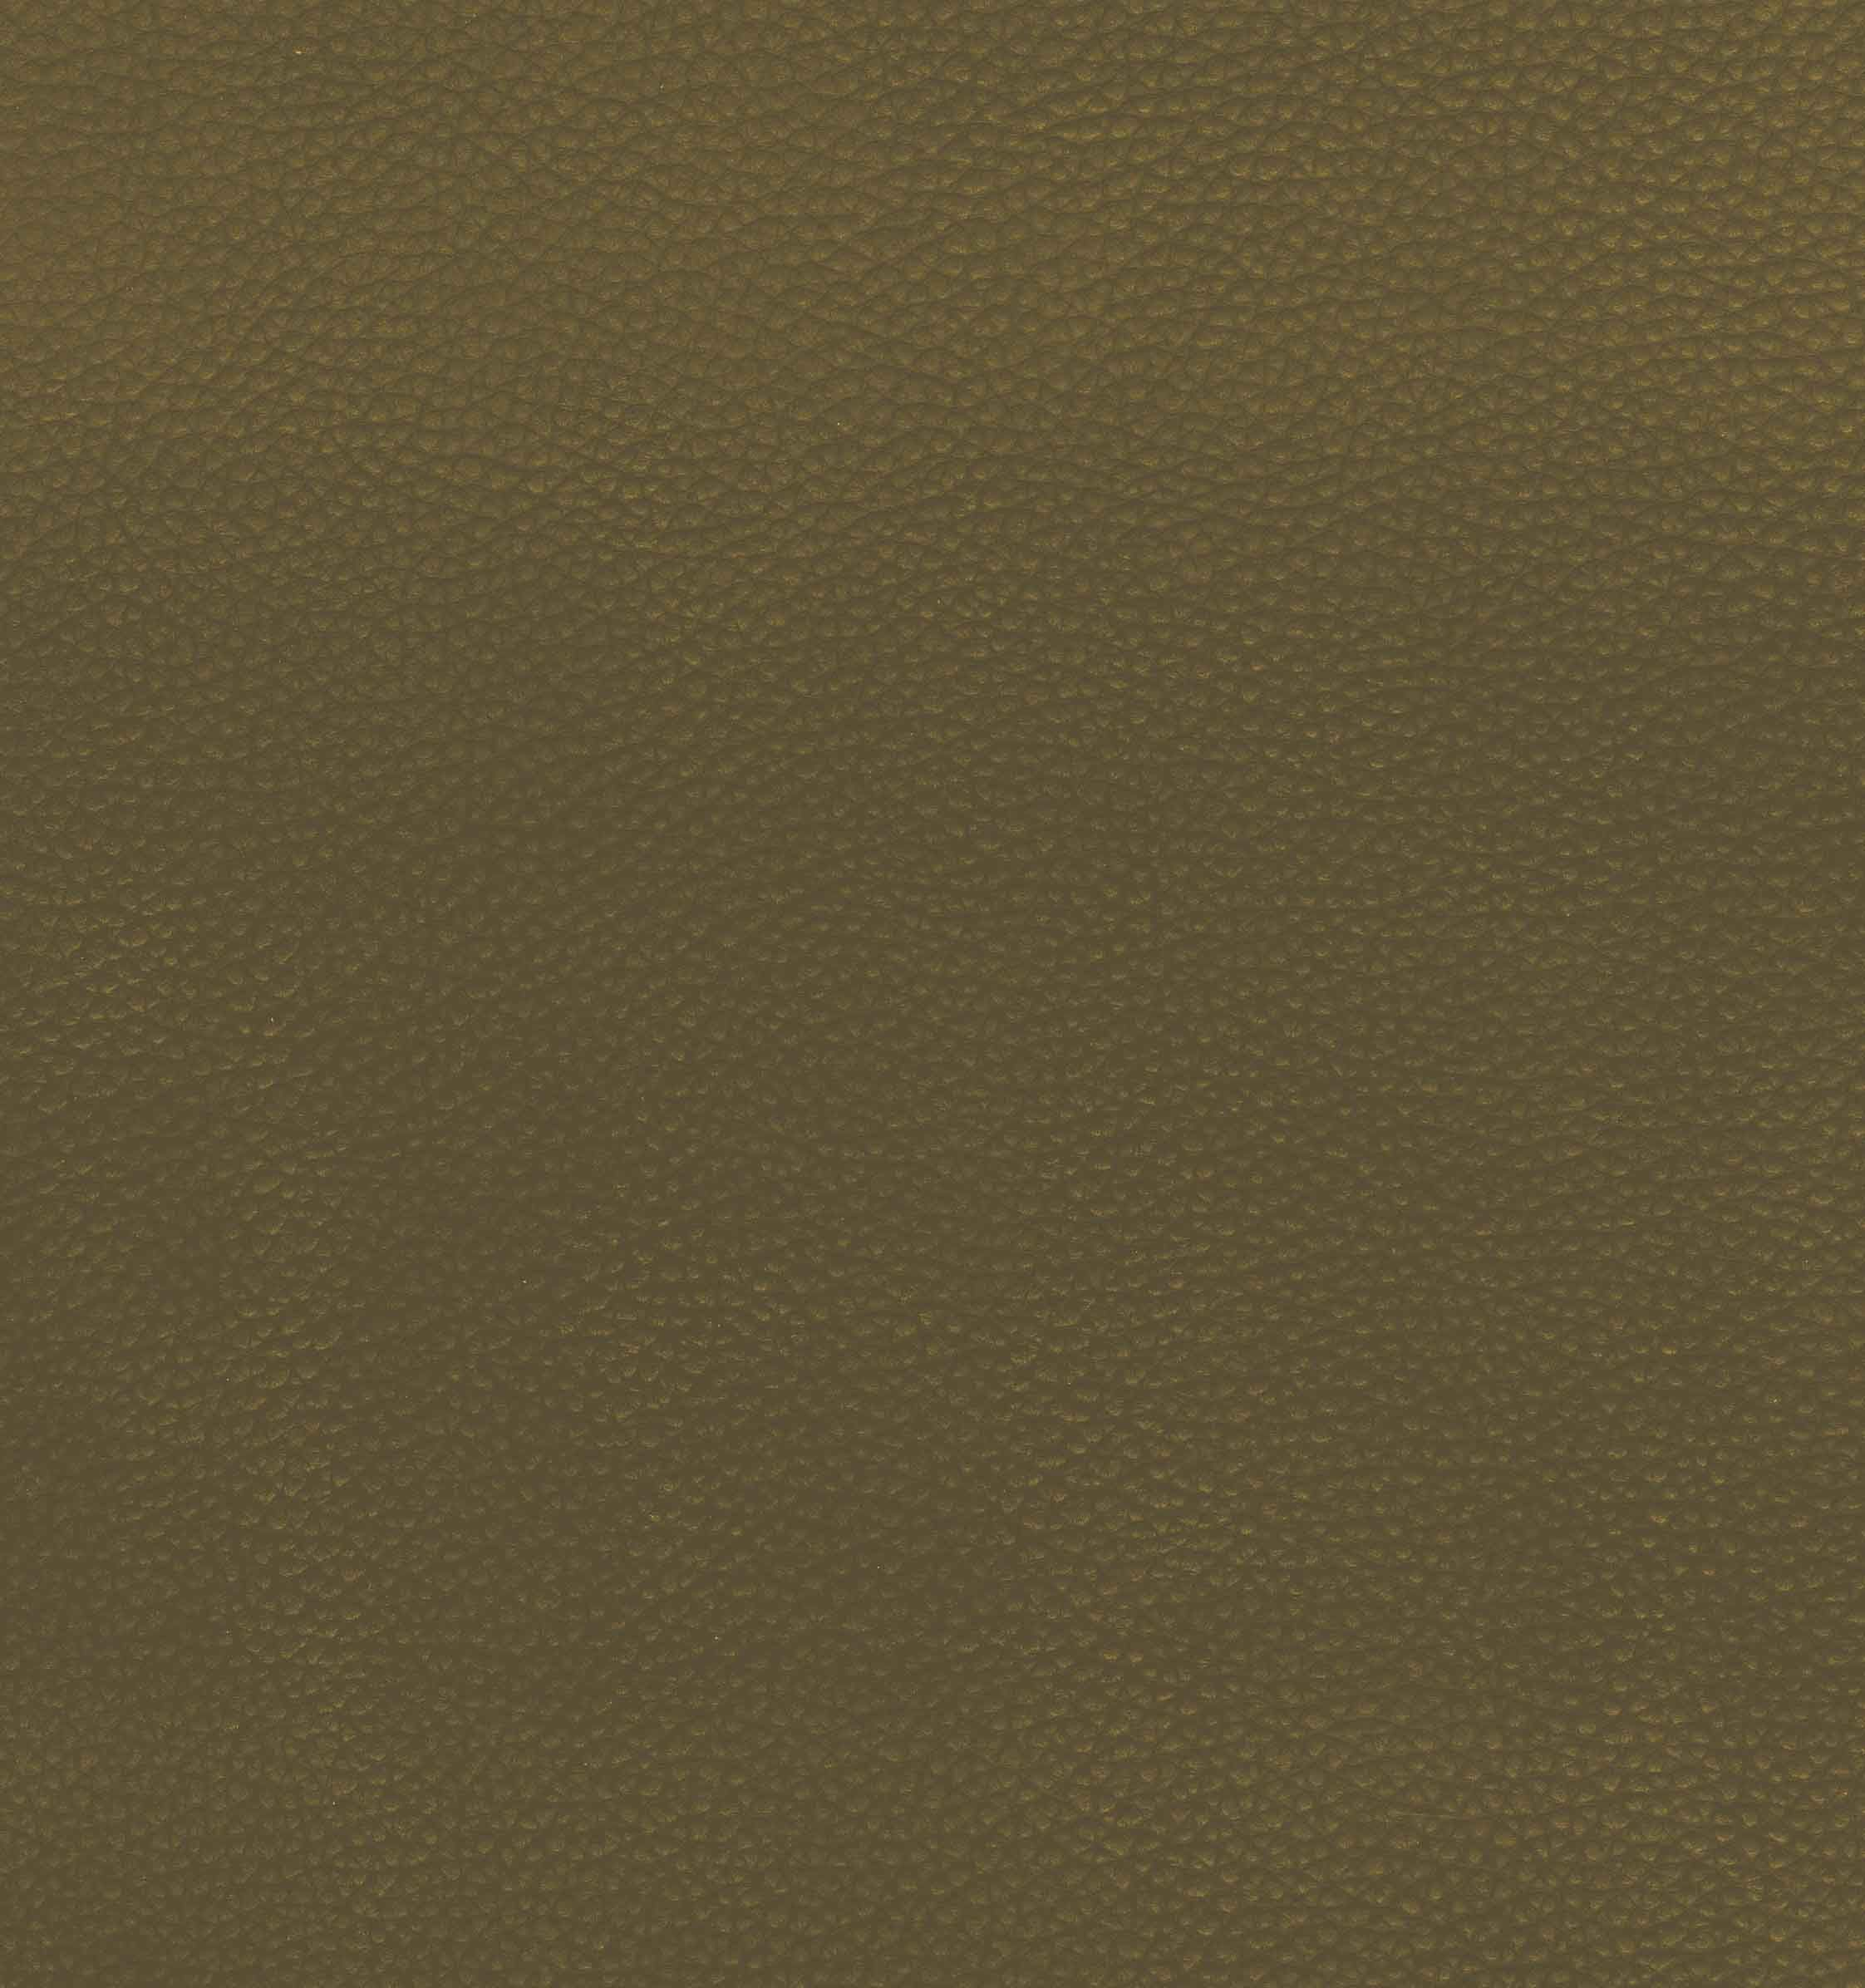 leather-drk-tan.jpg (2244×2392)